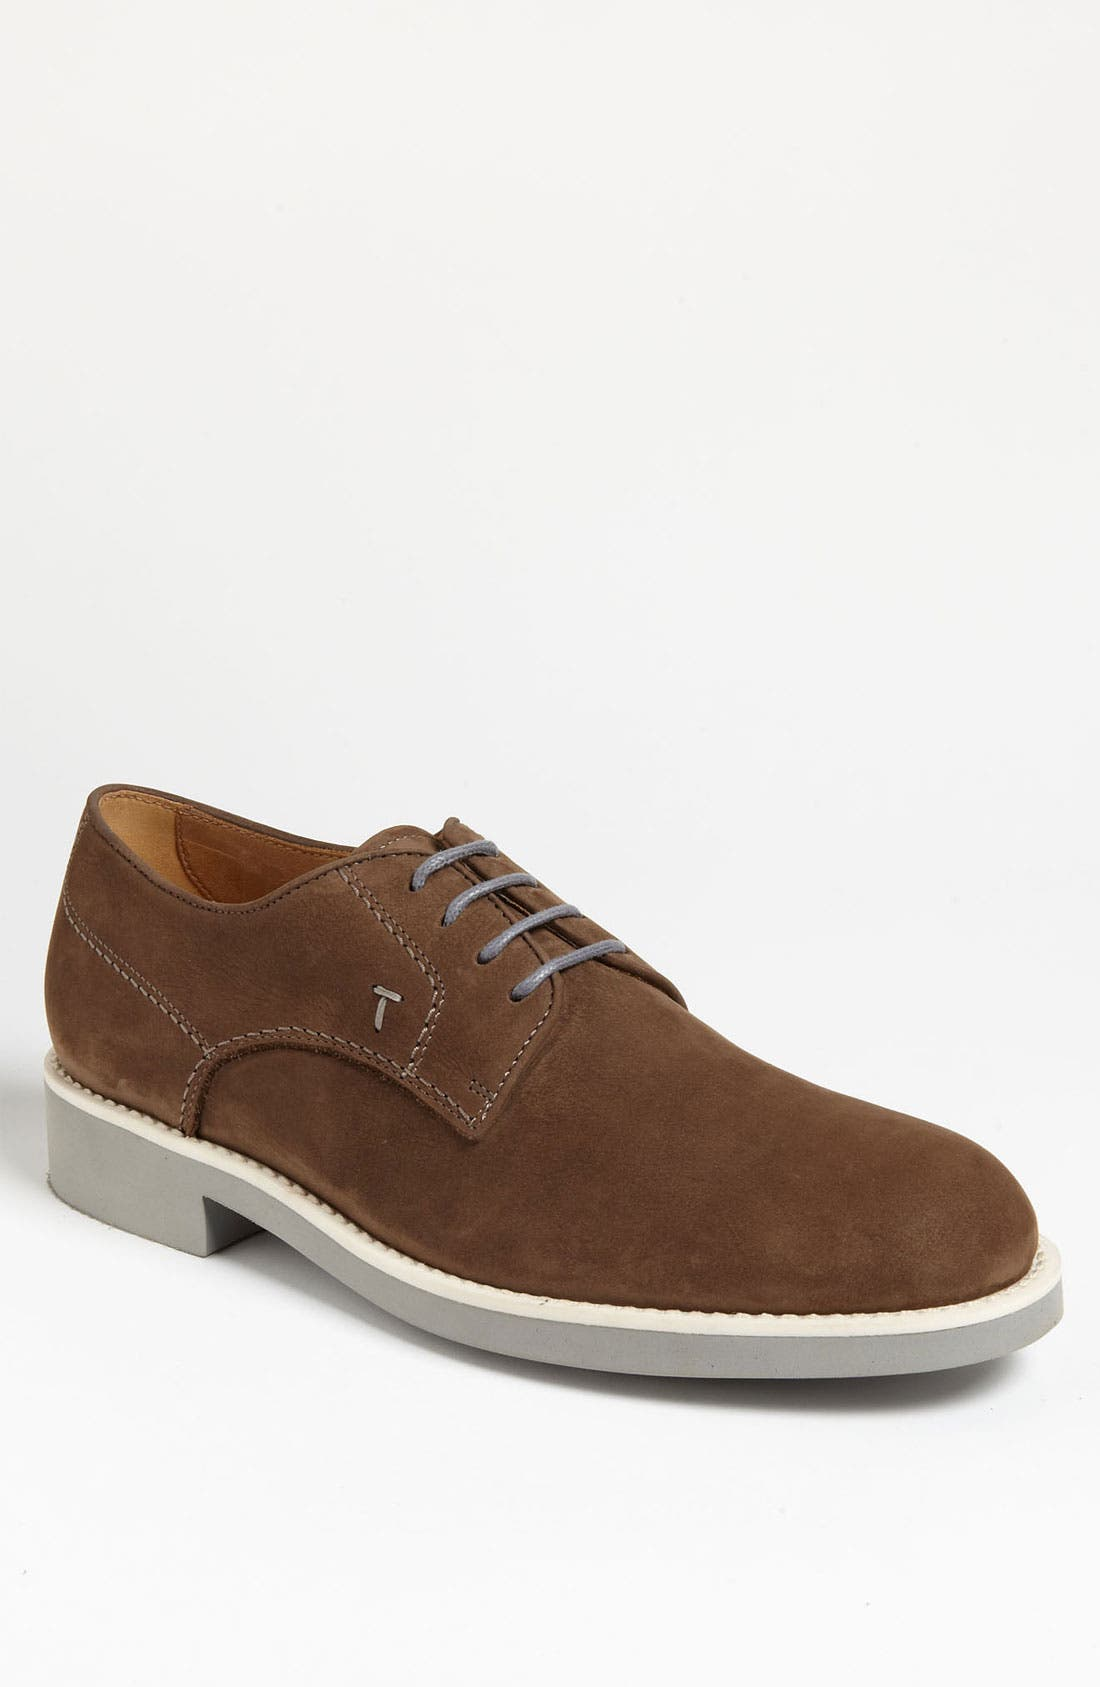 Main Image - Tod's Suede Buck Shoe